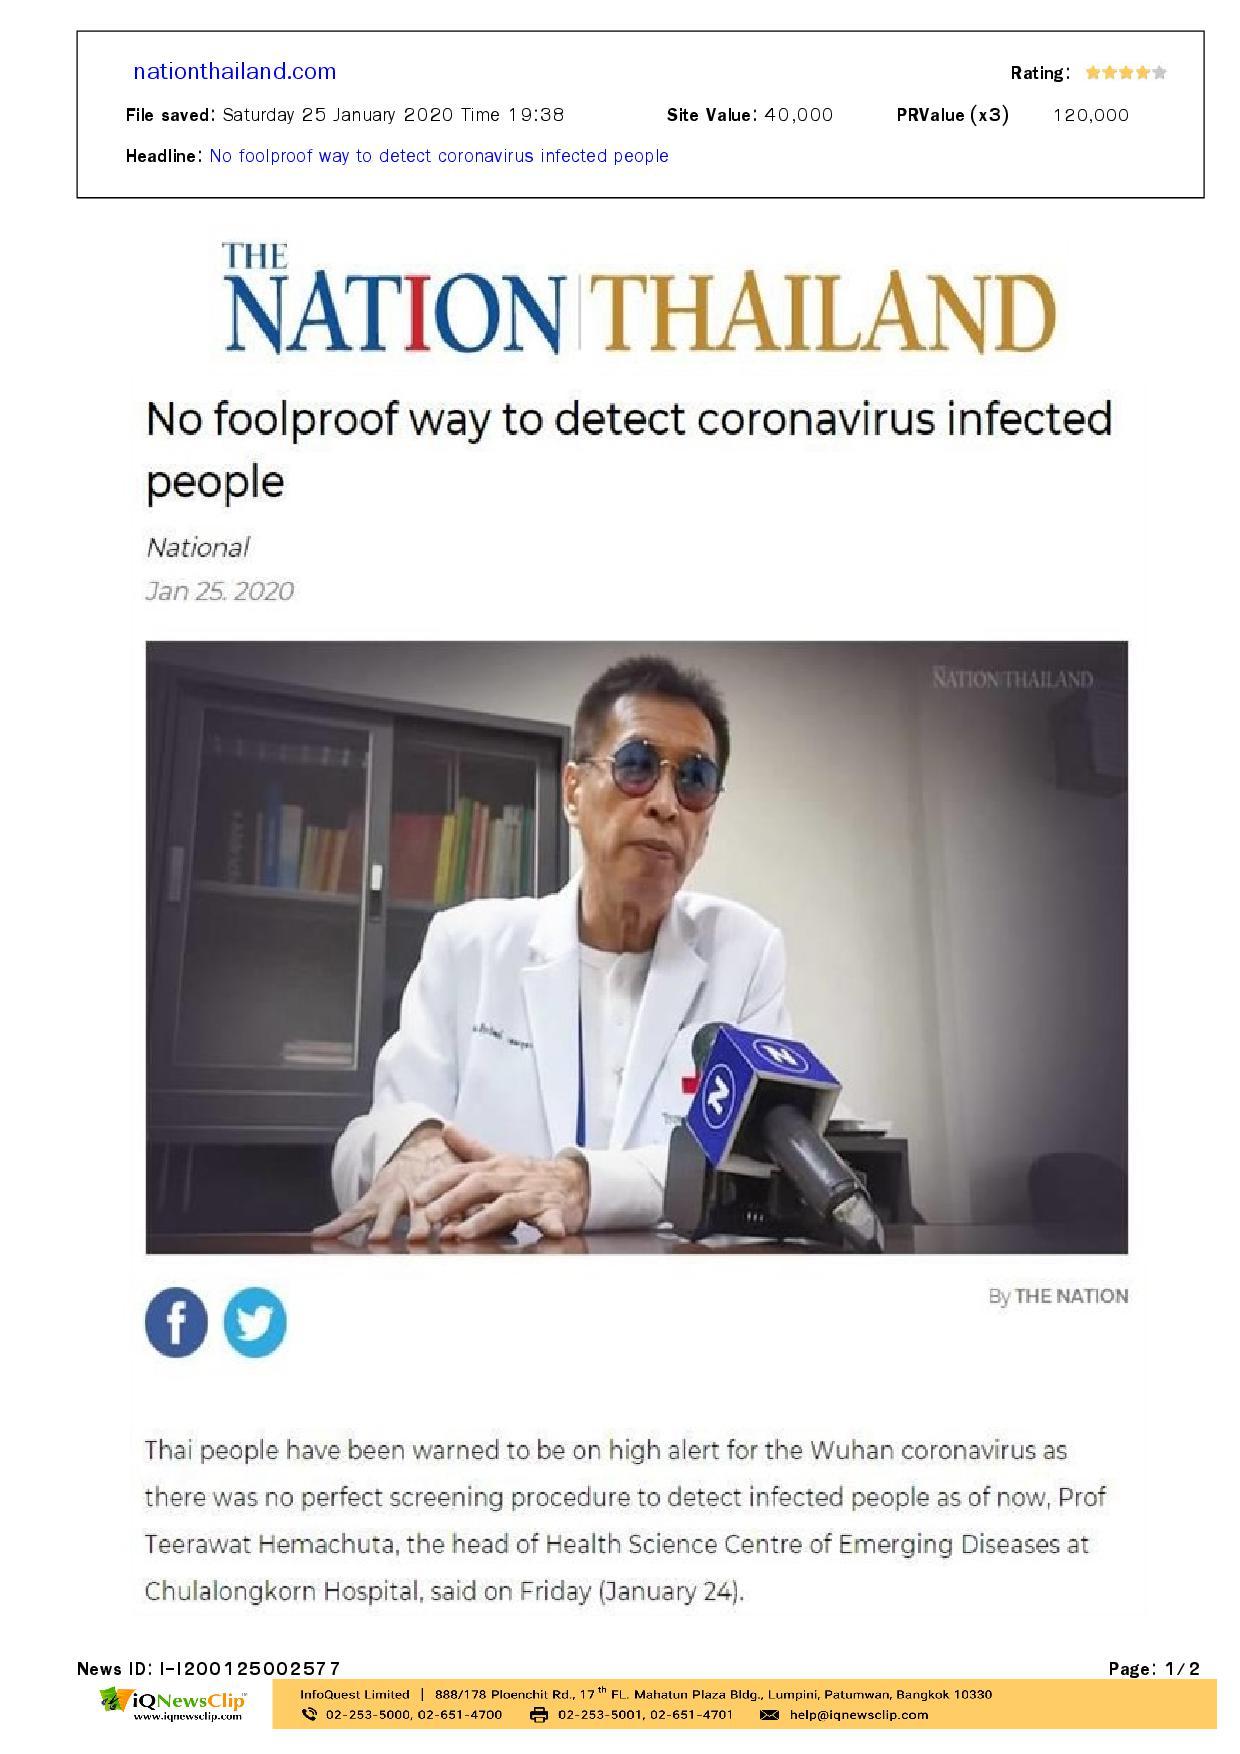 No foolproof way to detect coronavirus infected people